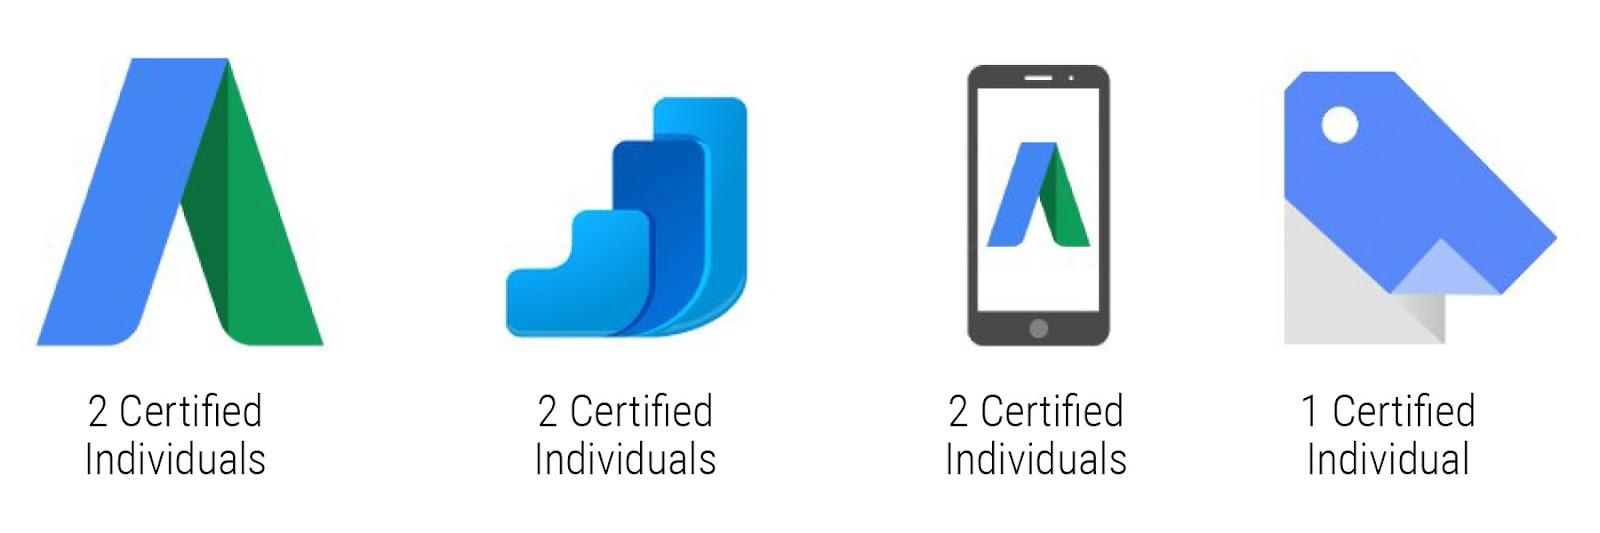 CenterRock - Individual Google Certifications